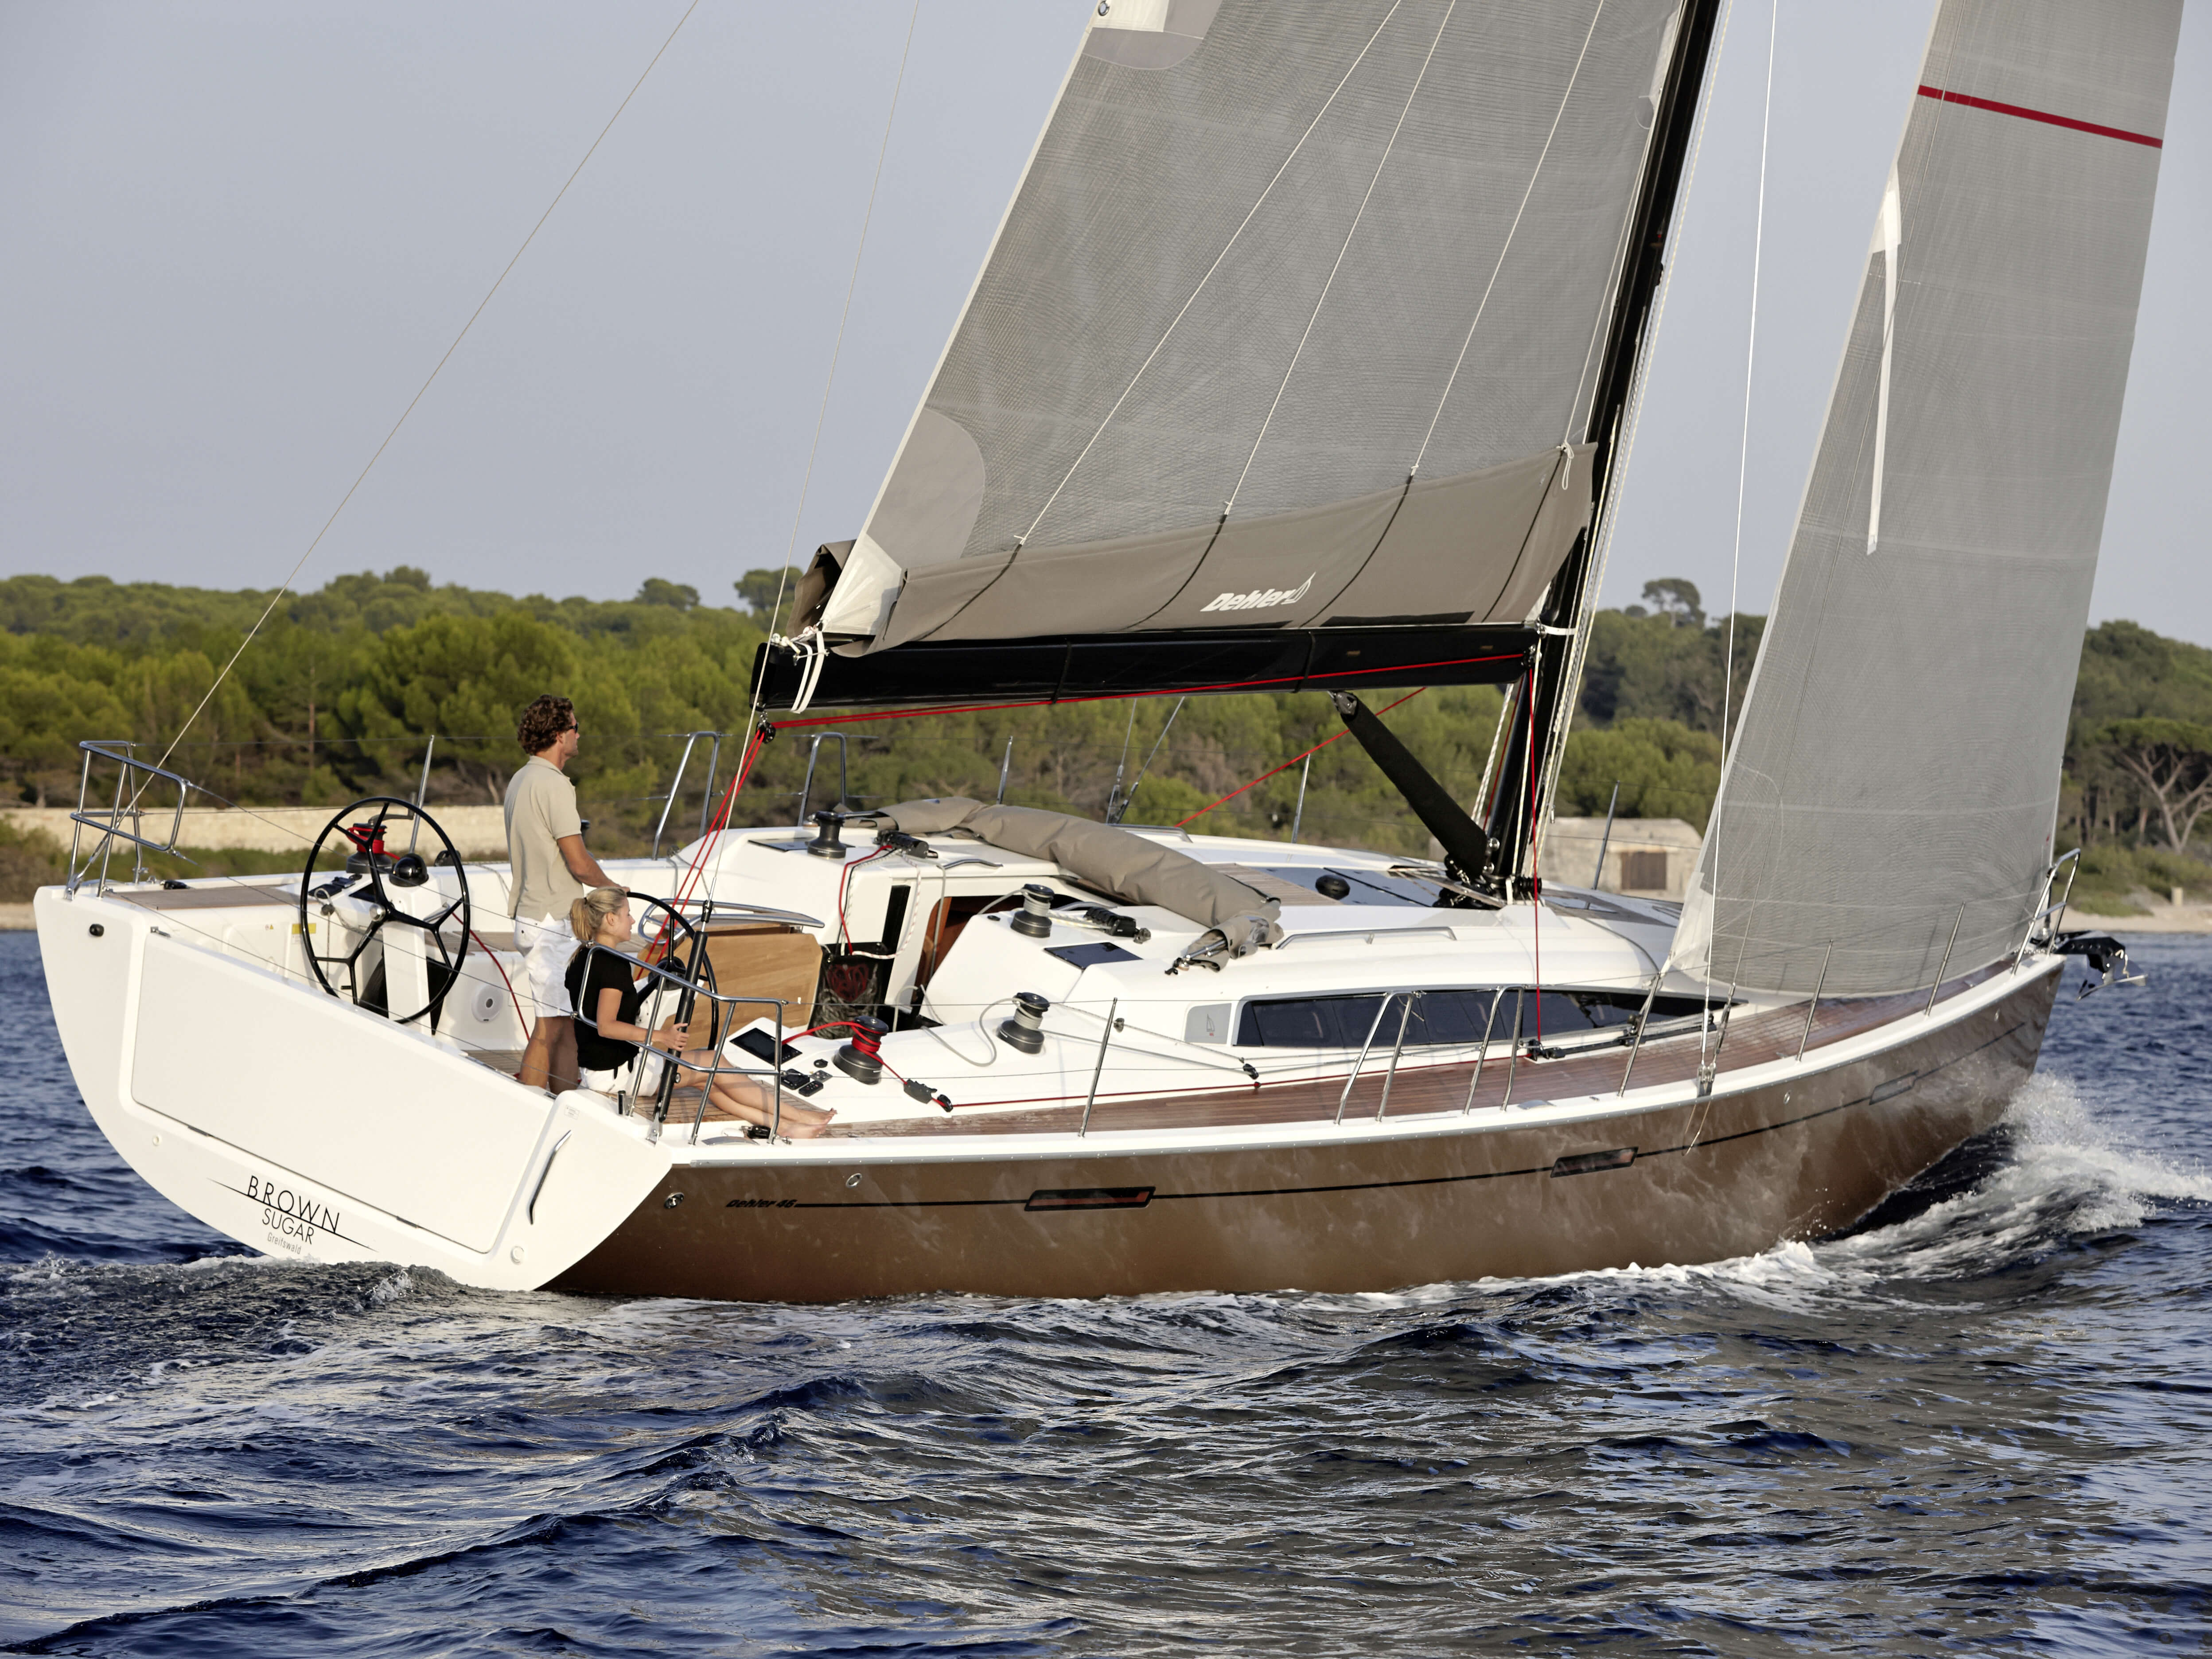 Dehler 46 Exterior Sailing | forsesail, mainsail, rear | Dehler